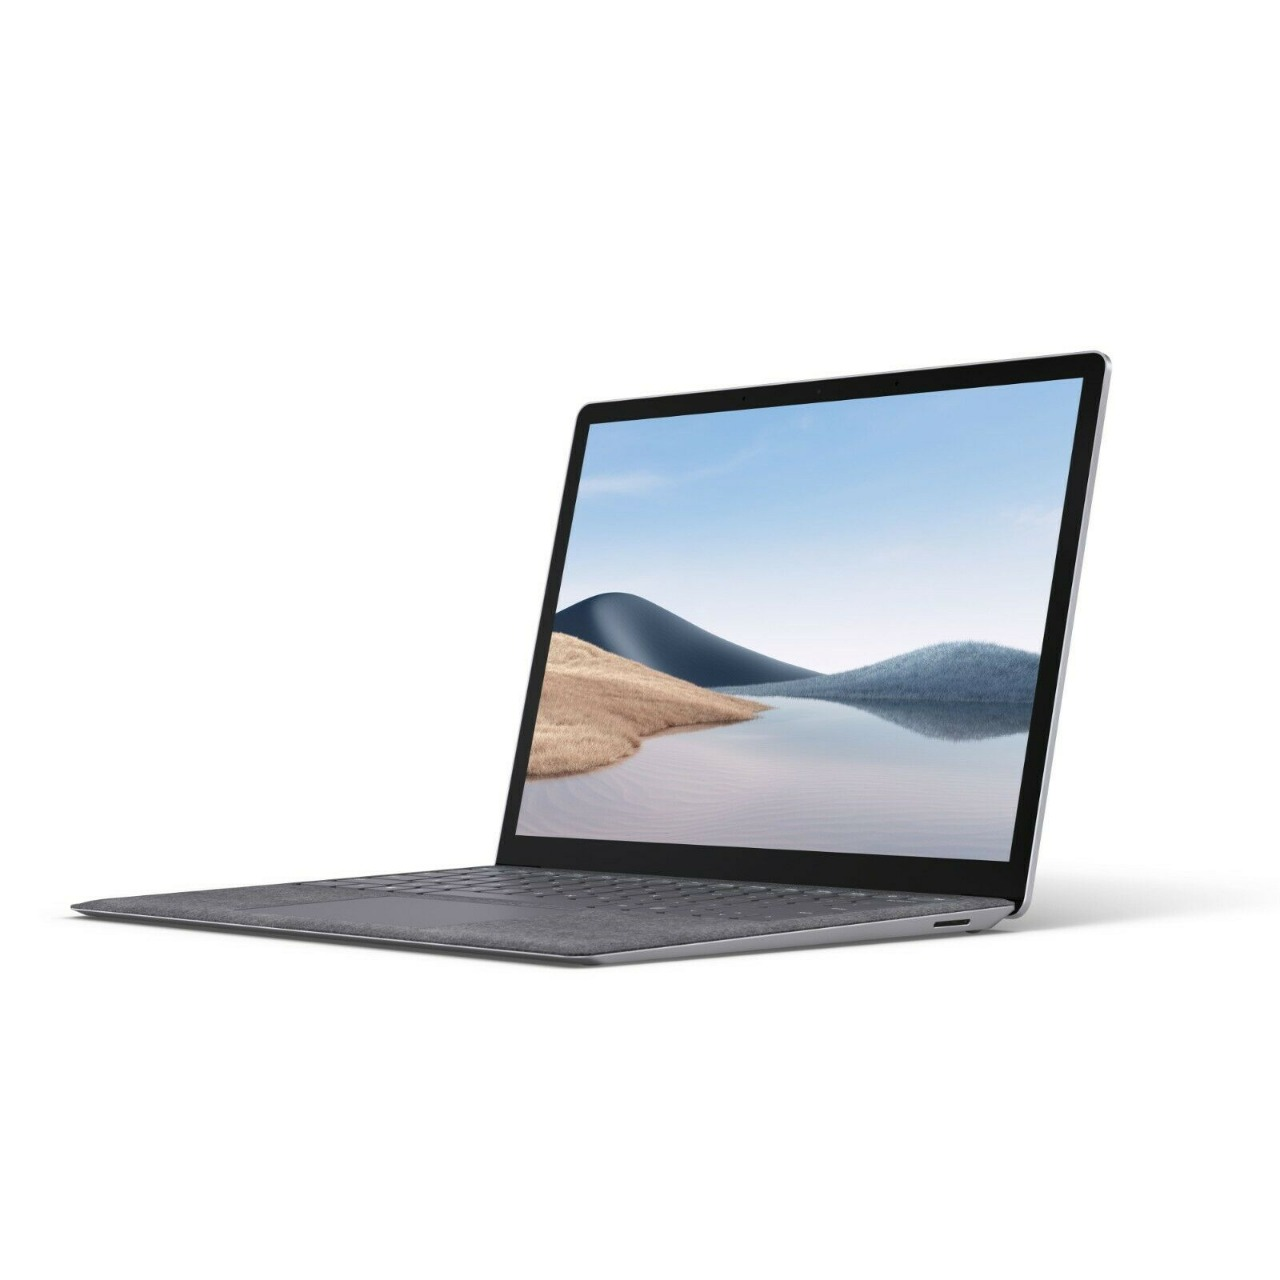 Microsoft Surface Laptop 4 13.5 AMD Ryzen 5 8GB RAM 256GB SSD Platinum